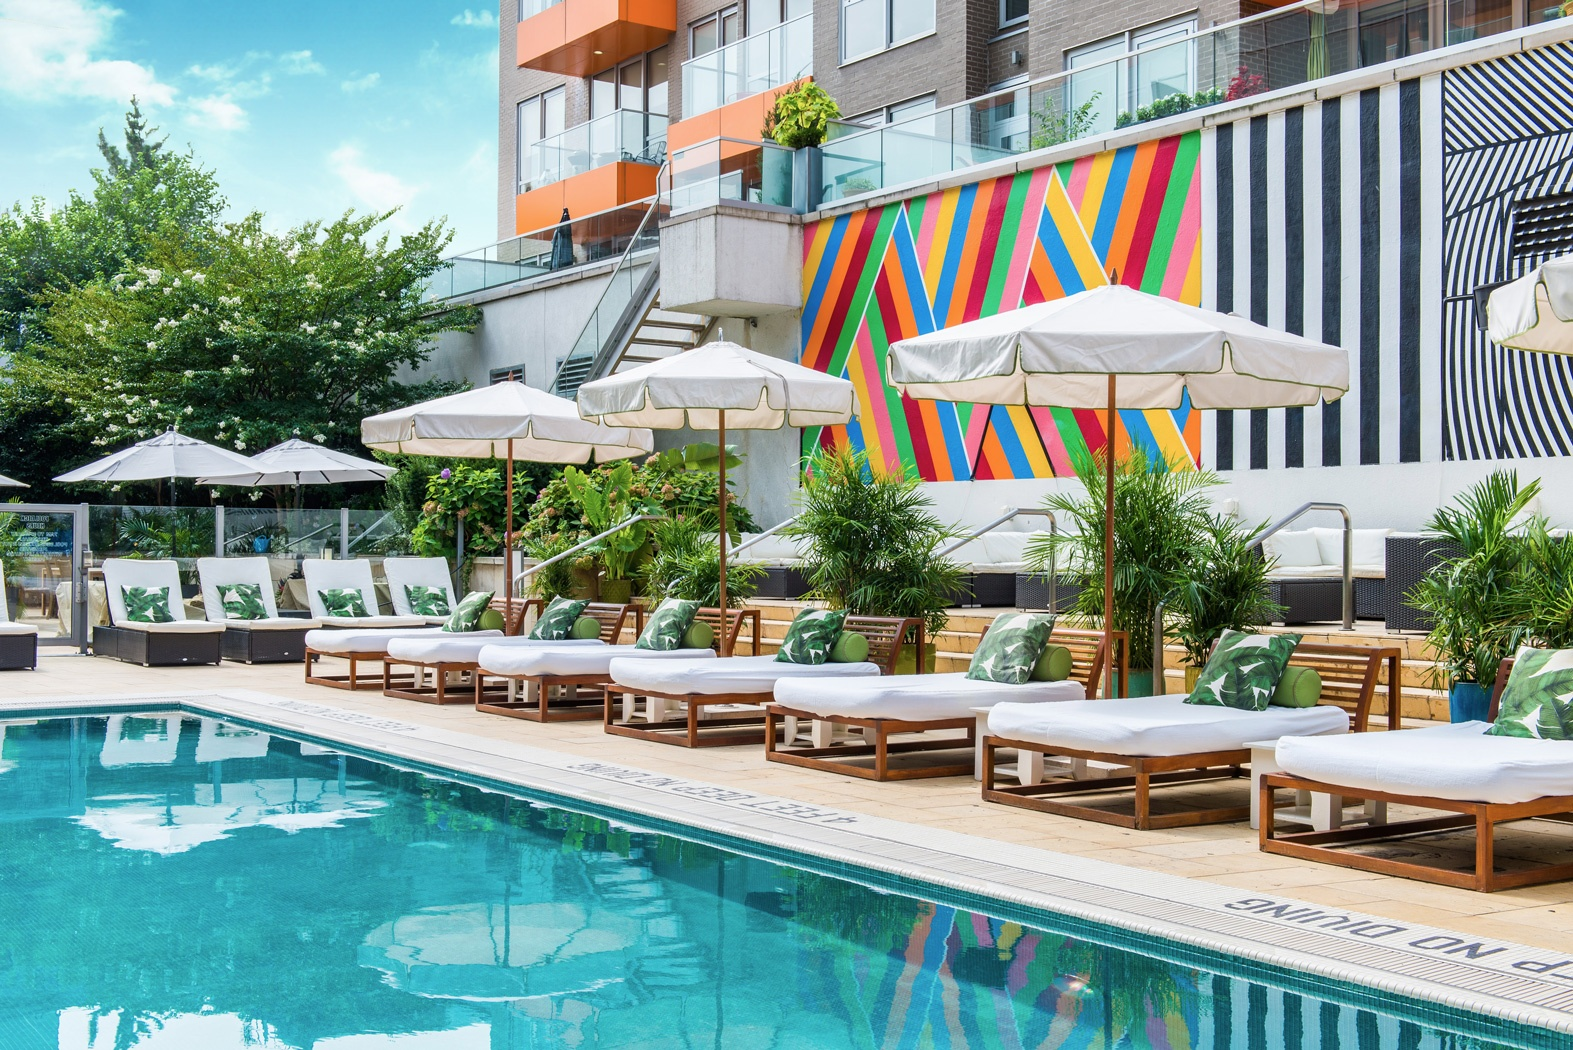 McCarren Hotel & Pool Debuts OpenKey's Mobile Key Access